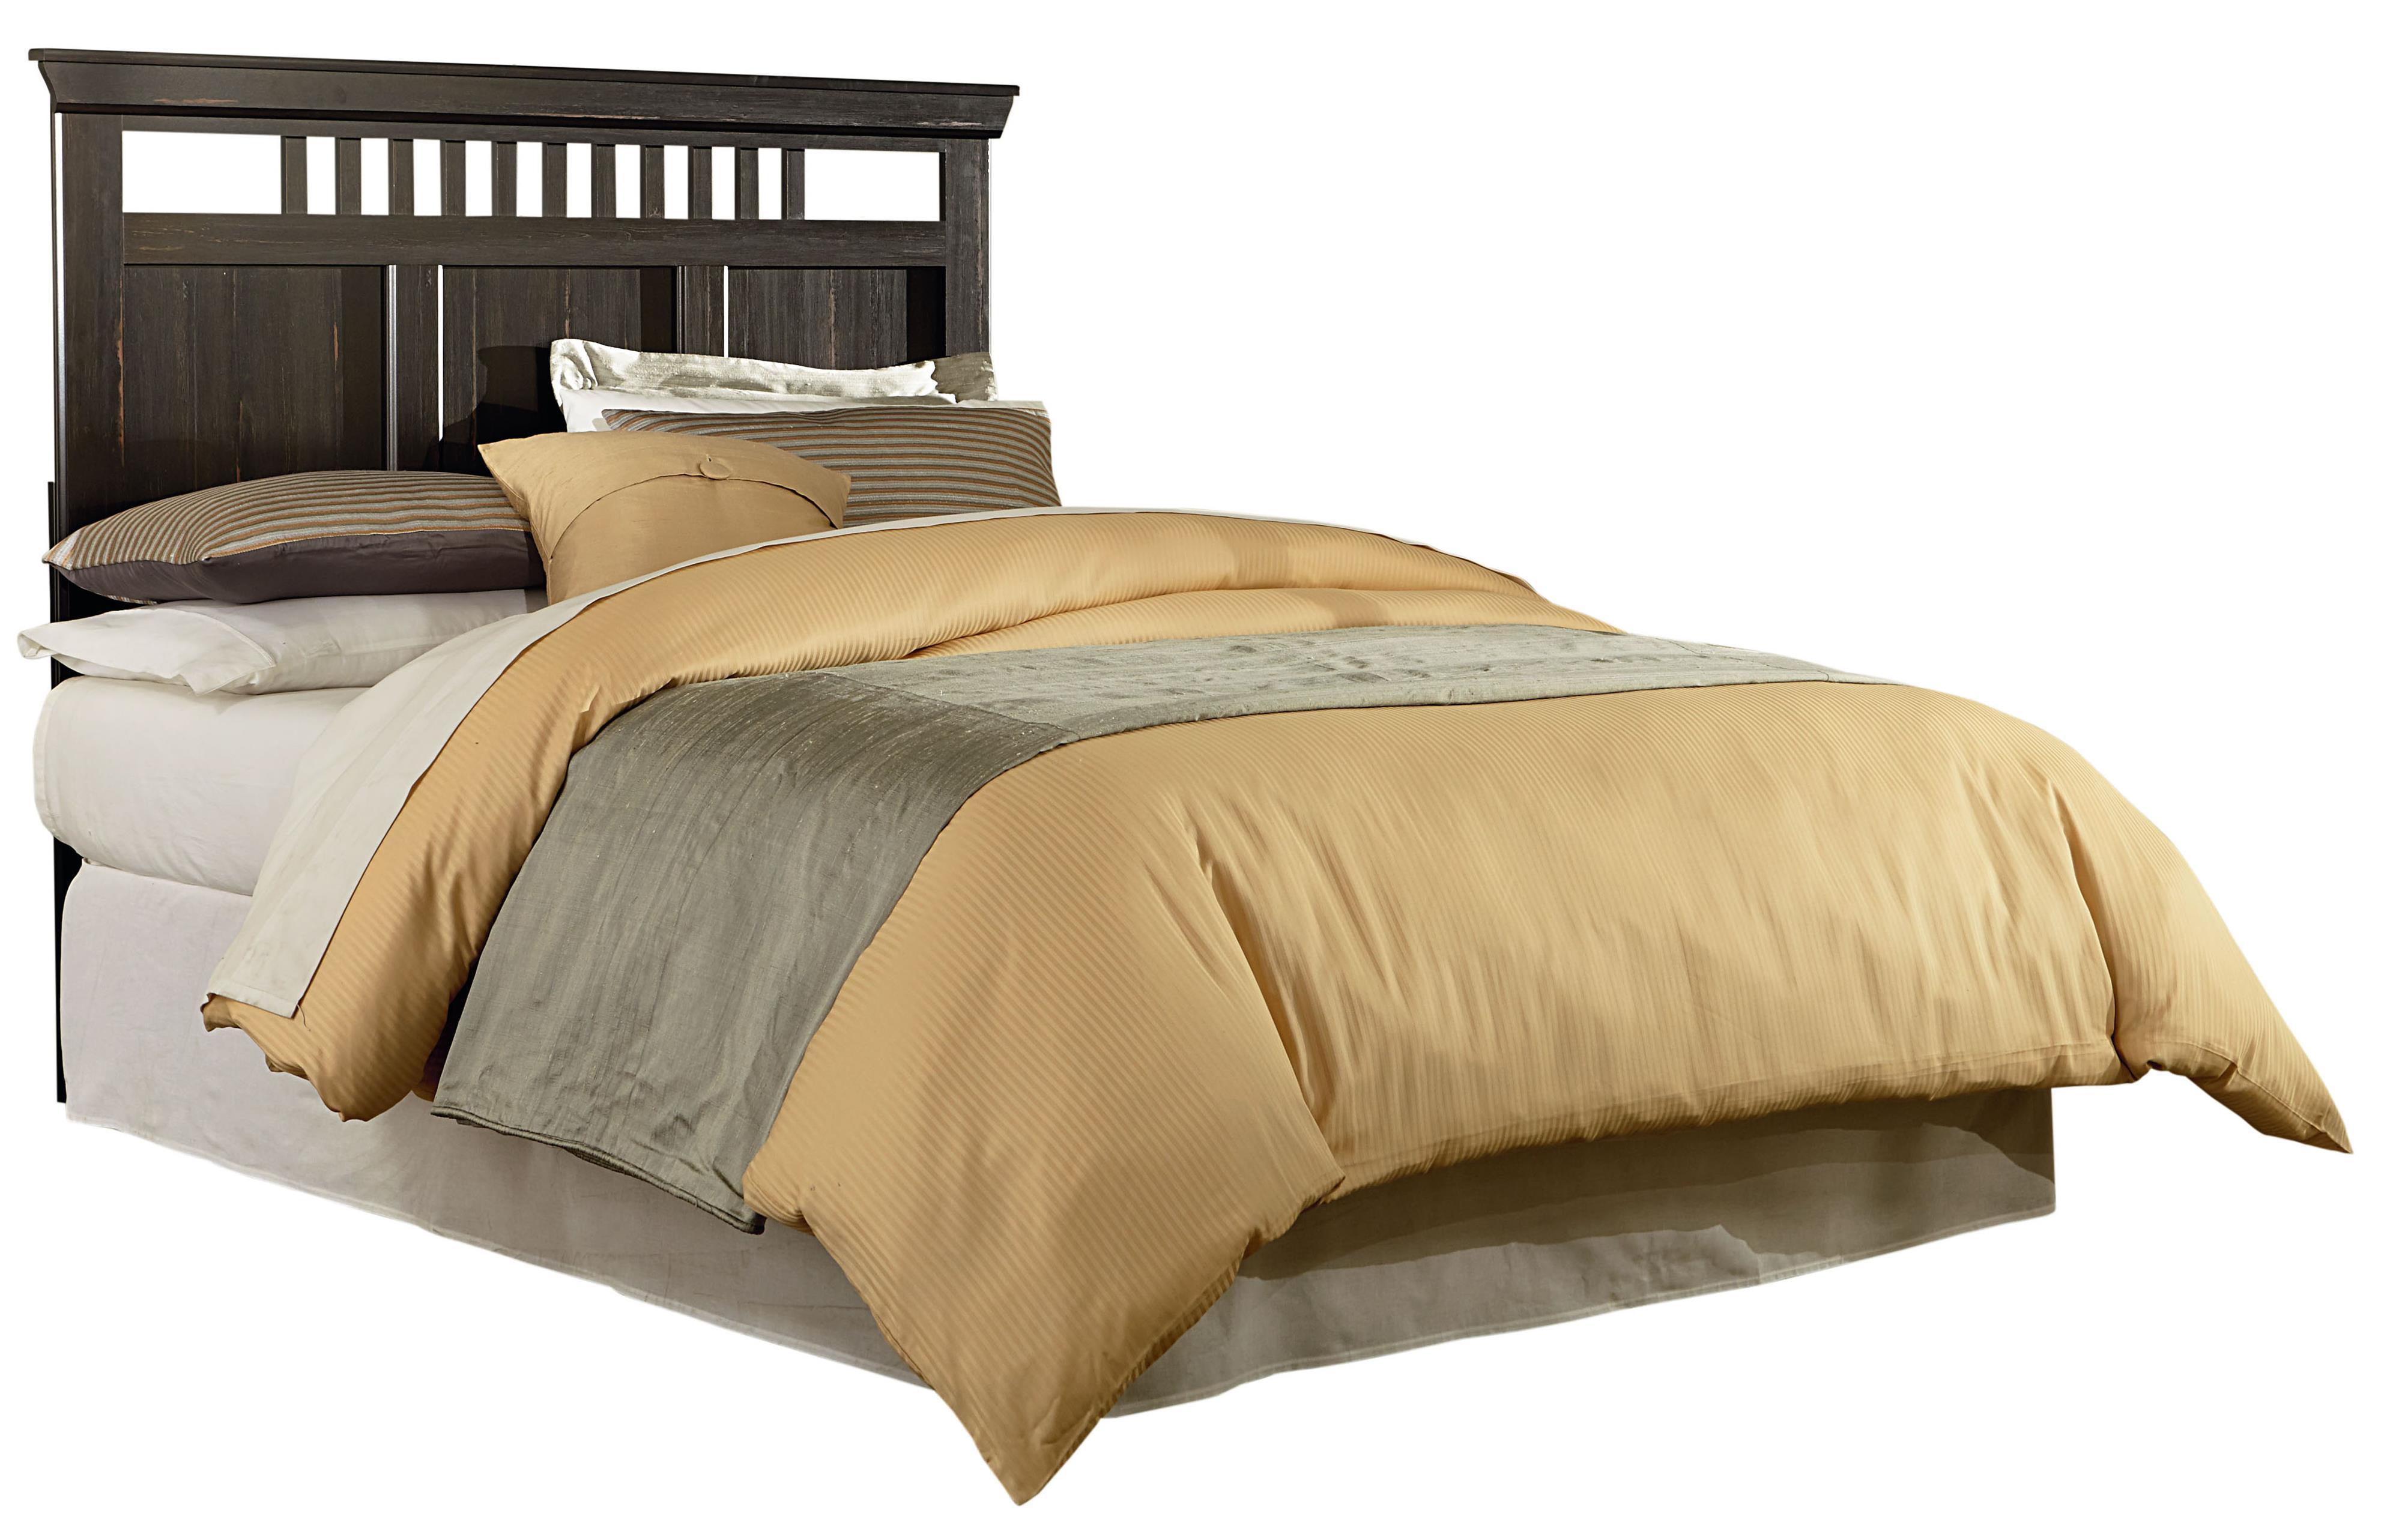 Standard Furniture Hampton King/California King Headboard - Item Number: 52066